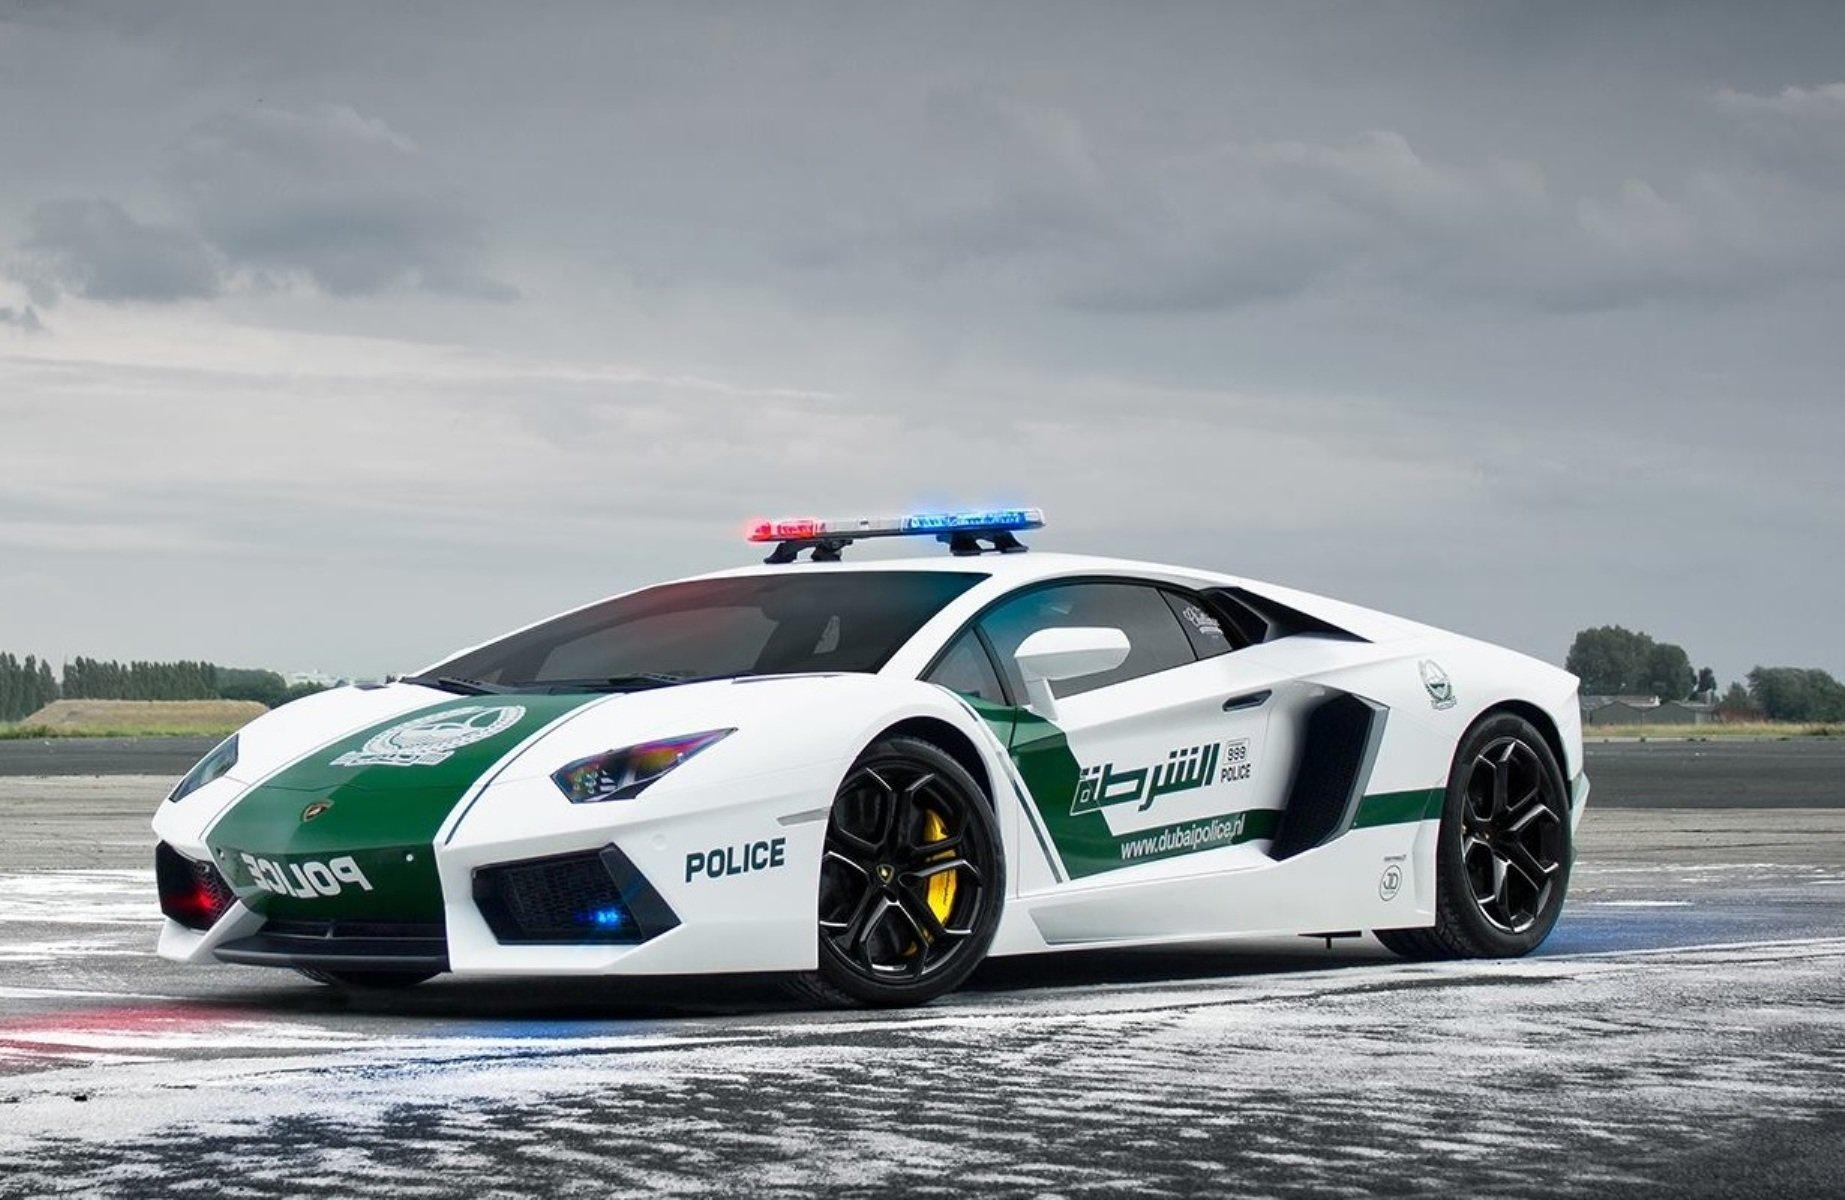 Police-Car-in-Dubai-Wallpaper-Pictures-HD-Dubai-Police-Car-Wallpaper ...